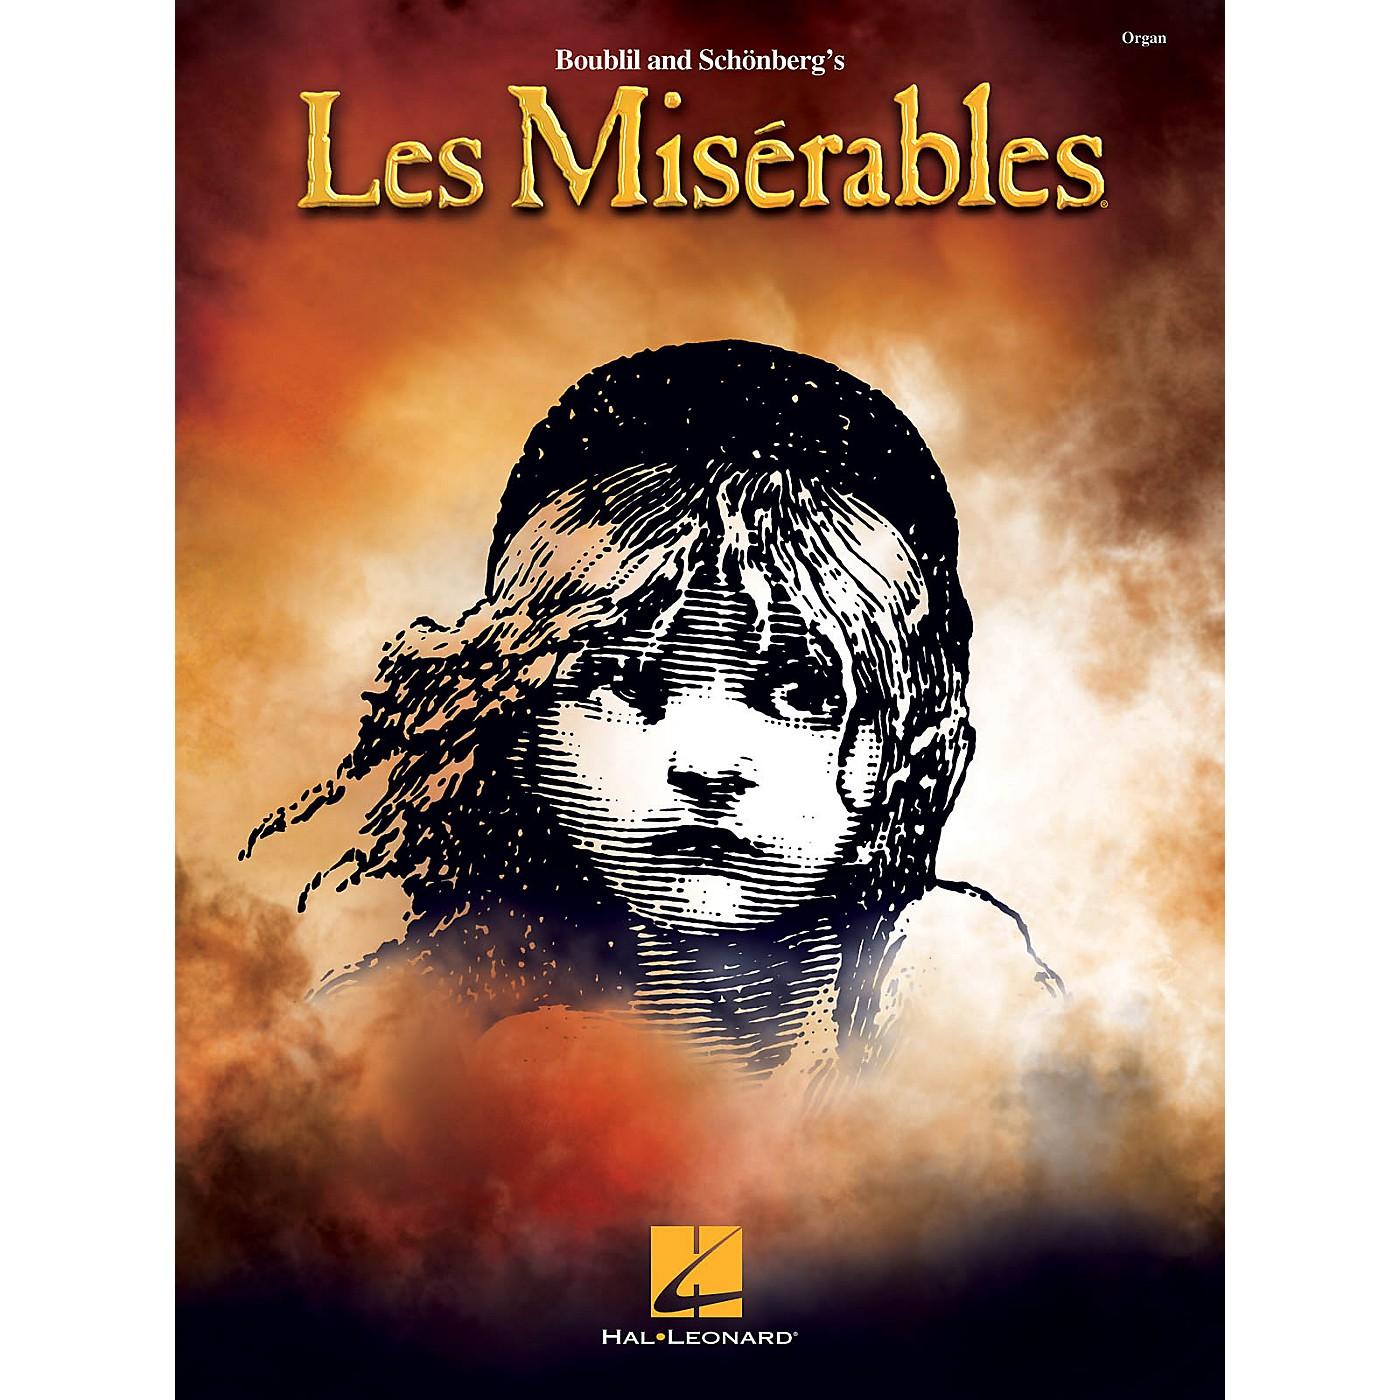 Hal Leonard Les Misérables Organ Folio Series Softcover thumbnail